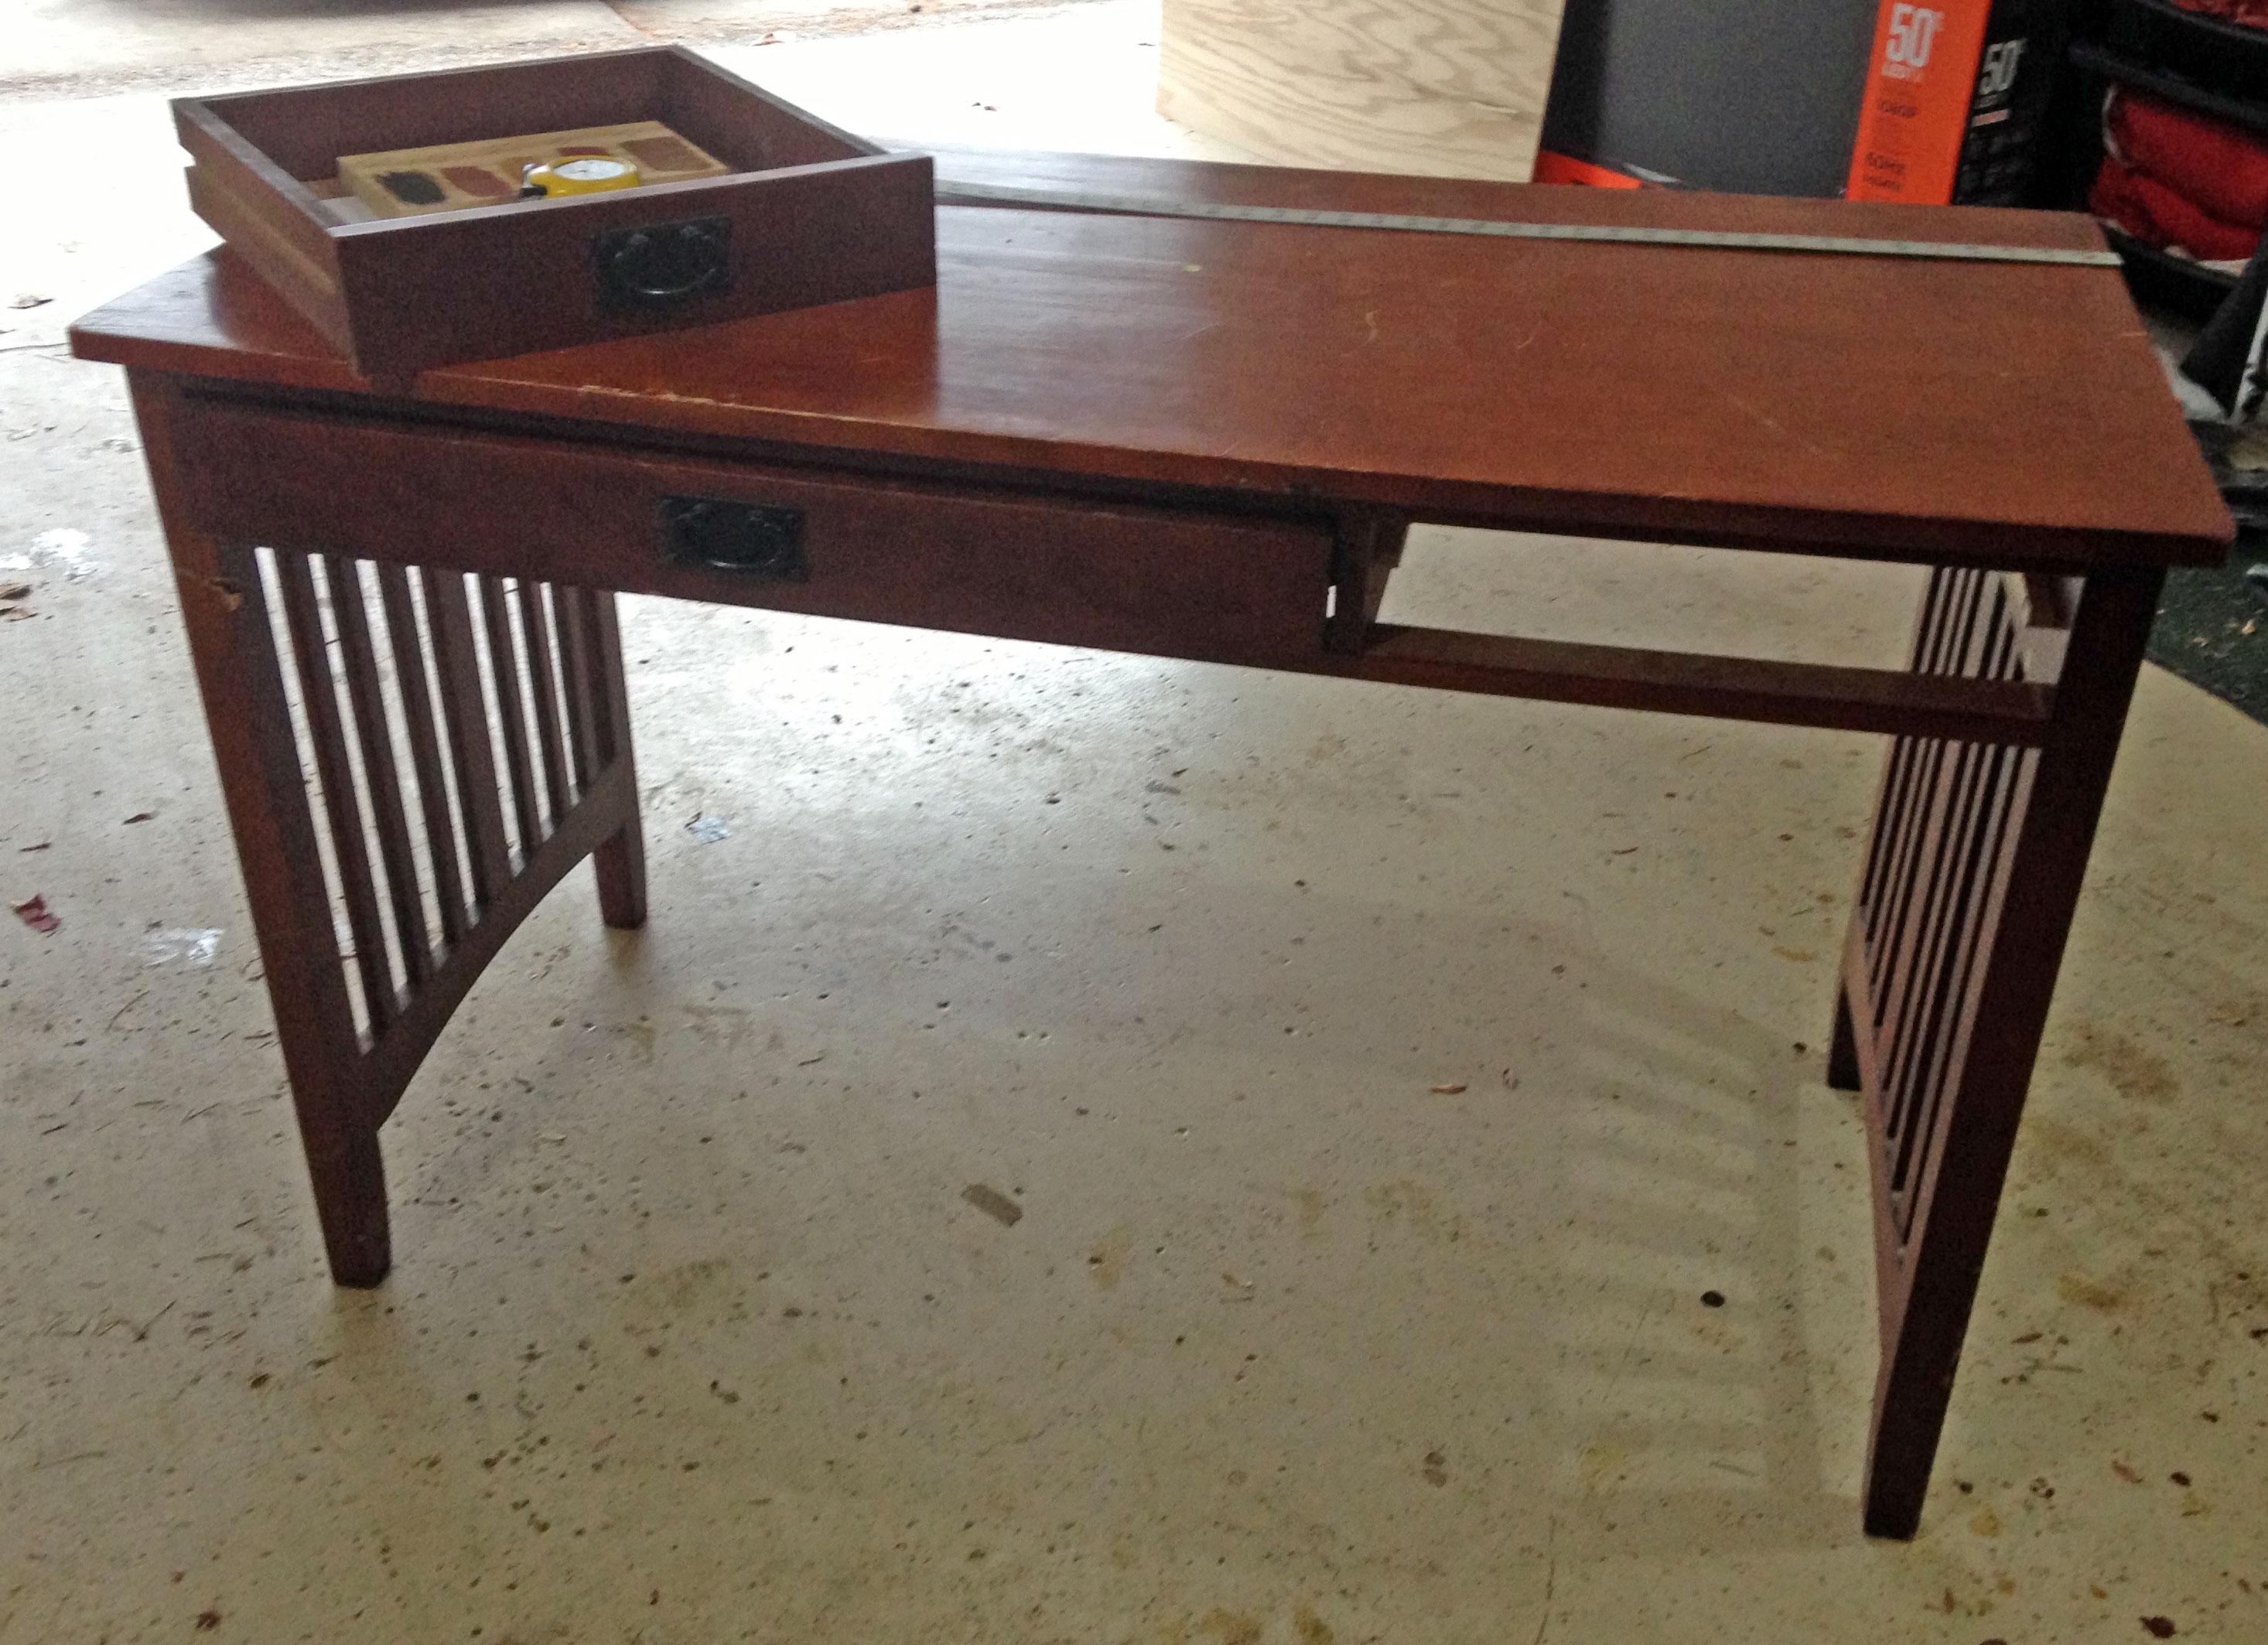 diy computer desk upcycled from a broken table jennifer maker